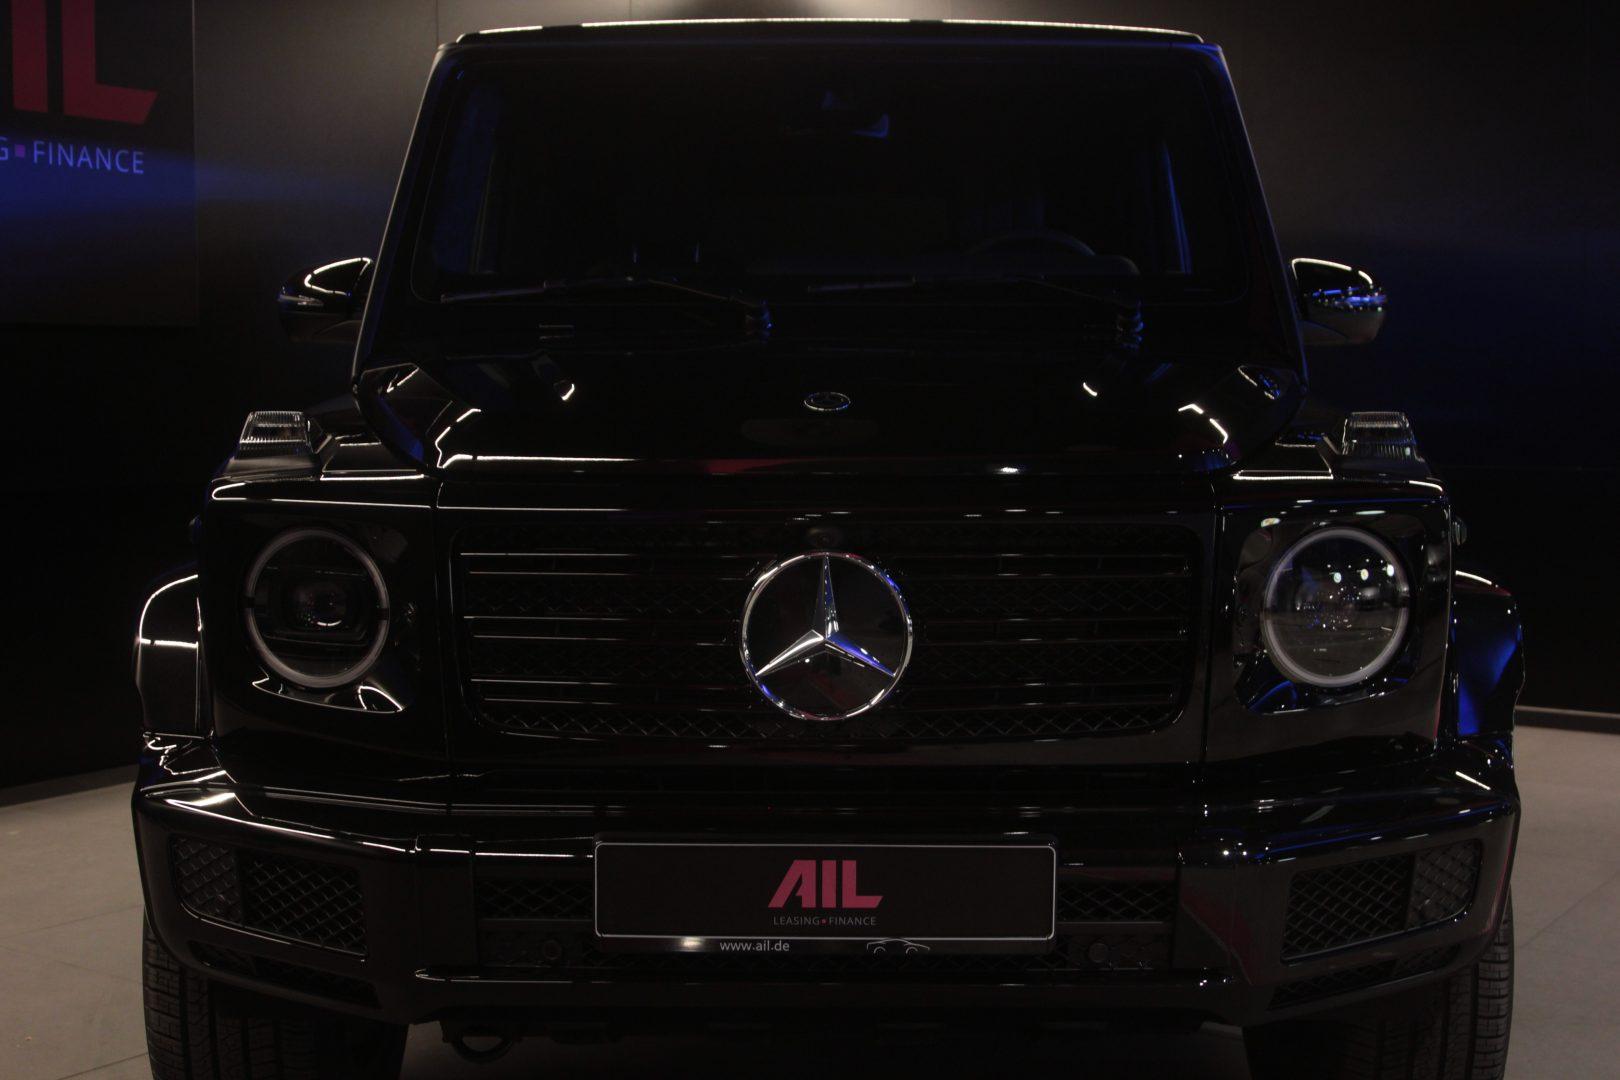 AIL Mercedes-Benz G 400 d Stronger than time Edition 5